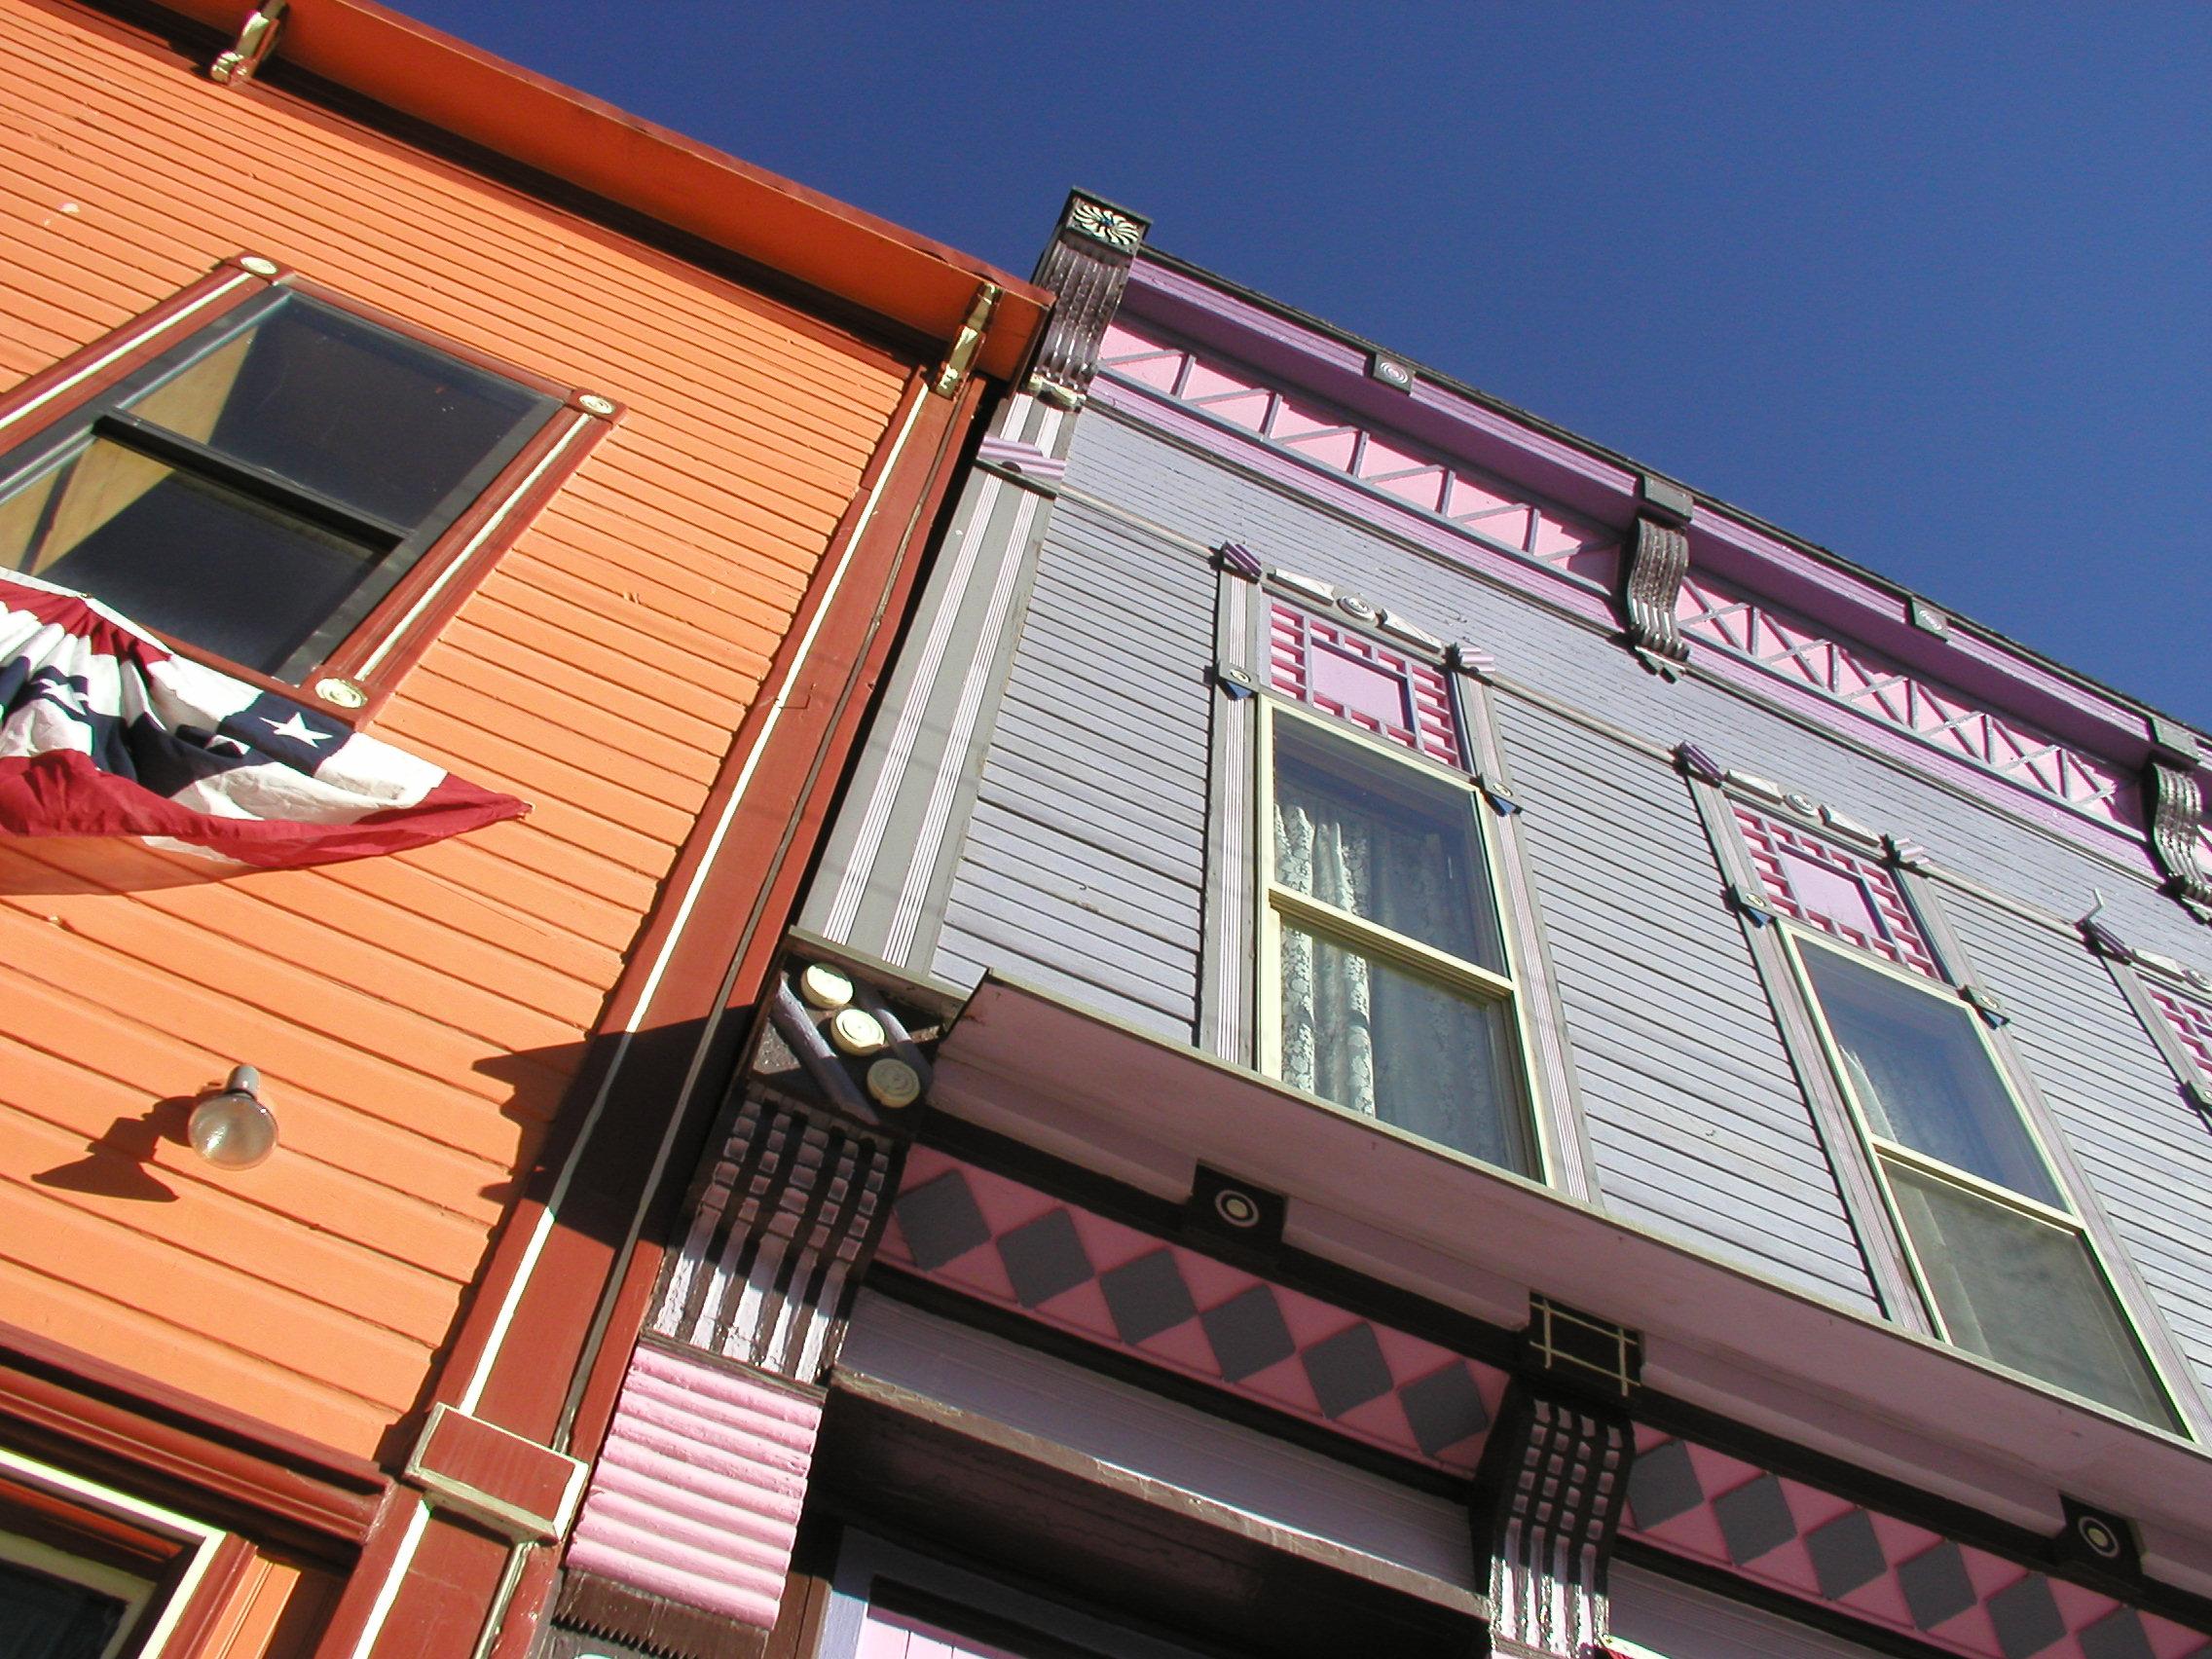 Картинки : окно, крыша, балкон, фасад, колорадо, оконное пок.